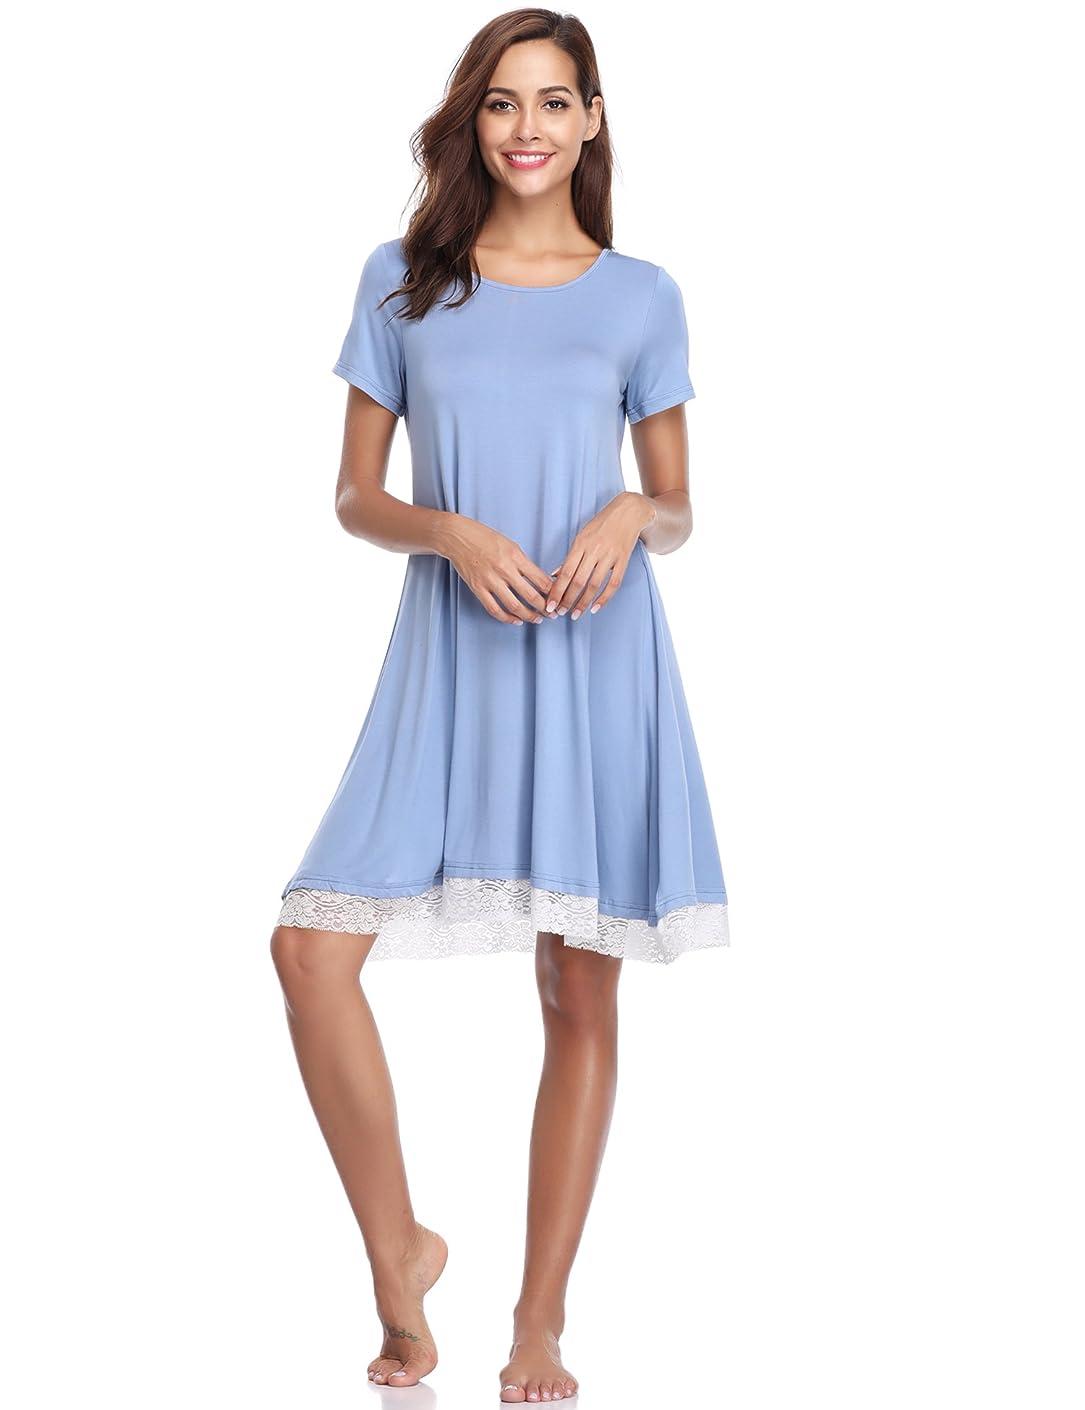 Aibrou Womens Nightgown Short Sleeve Ultra-Soft Lace Trim Summer Nightdress Lounge Sleepwear